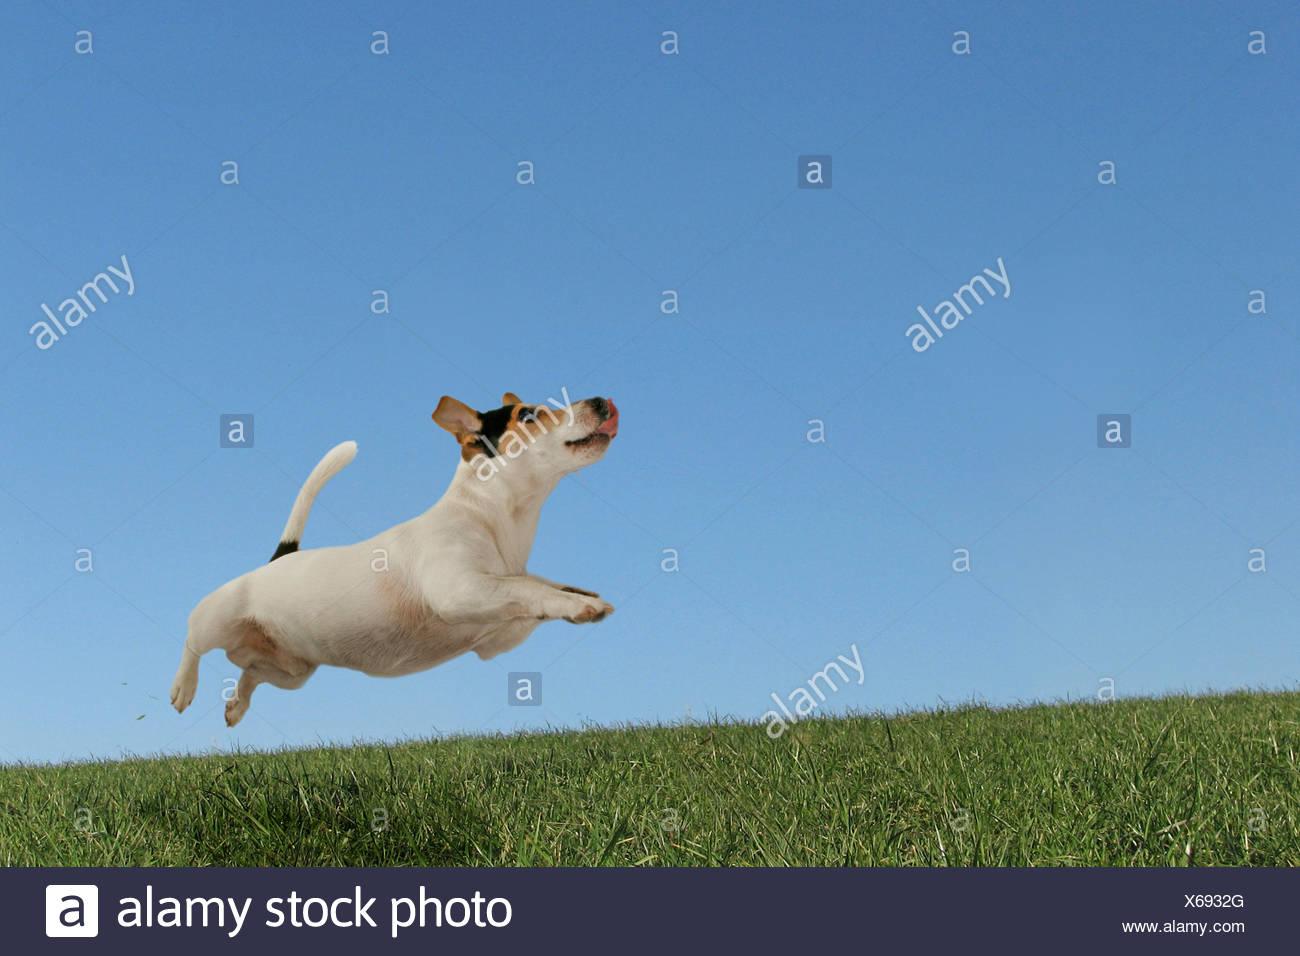 Running Jack Russell - Stock Image